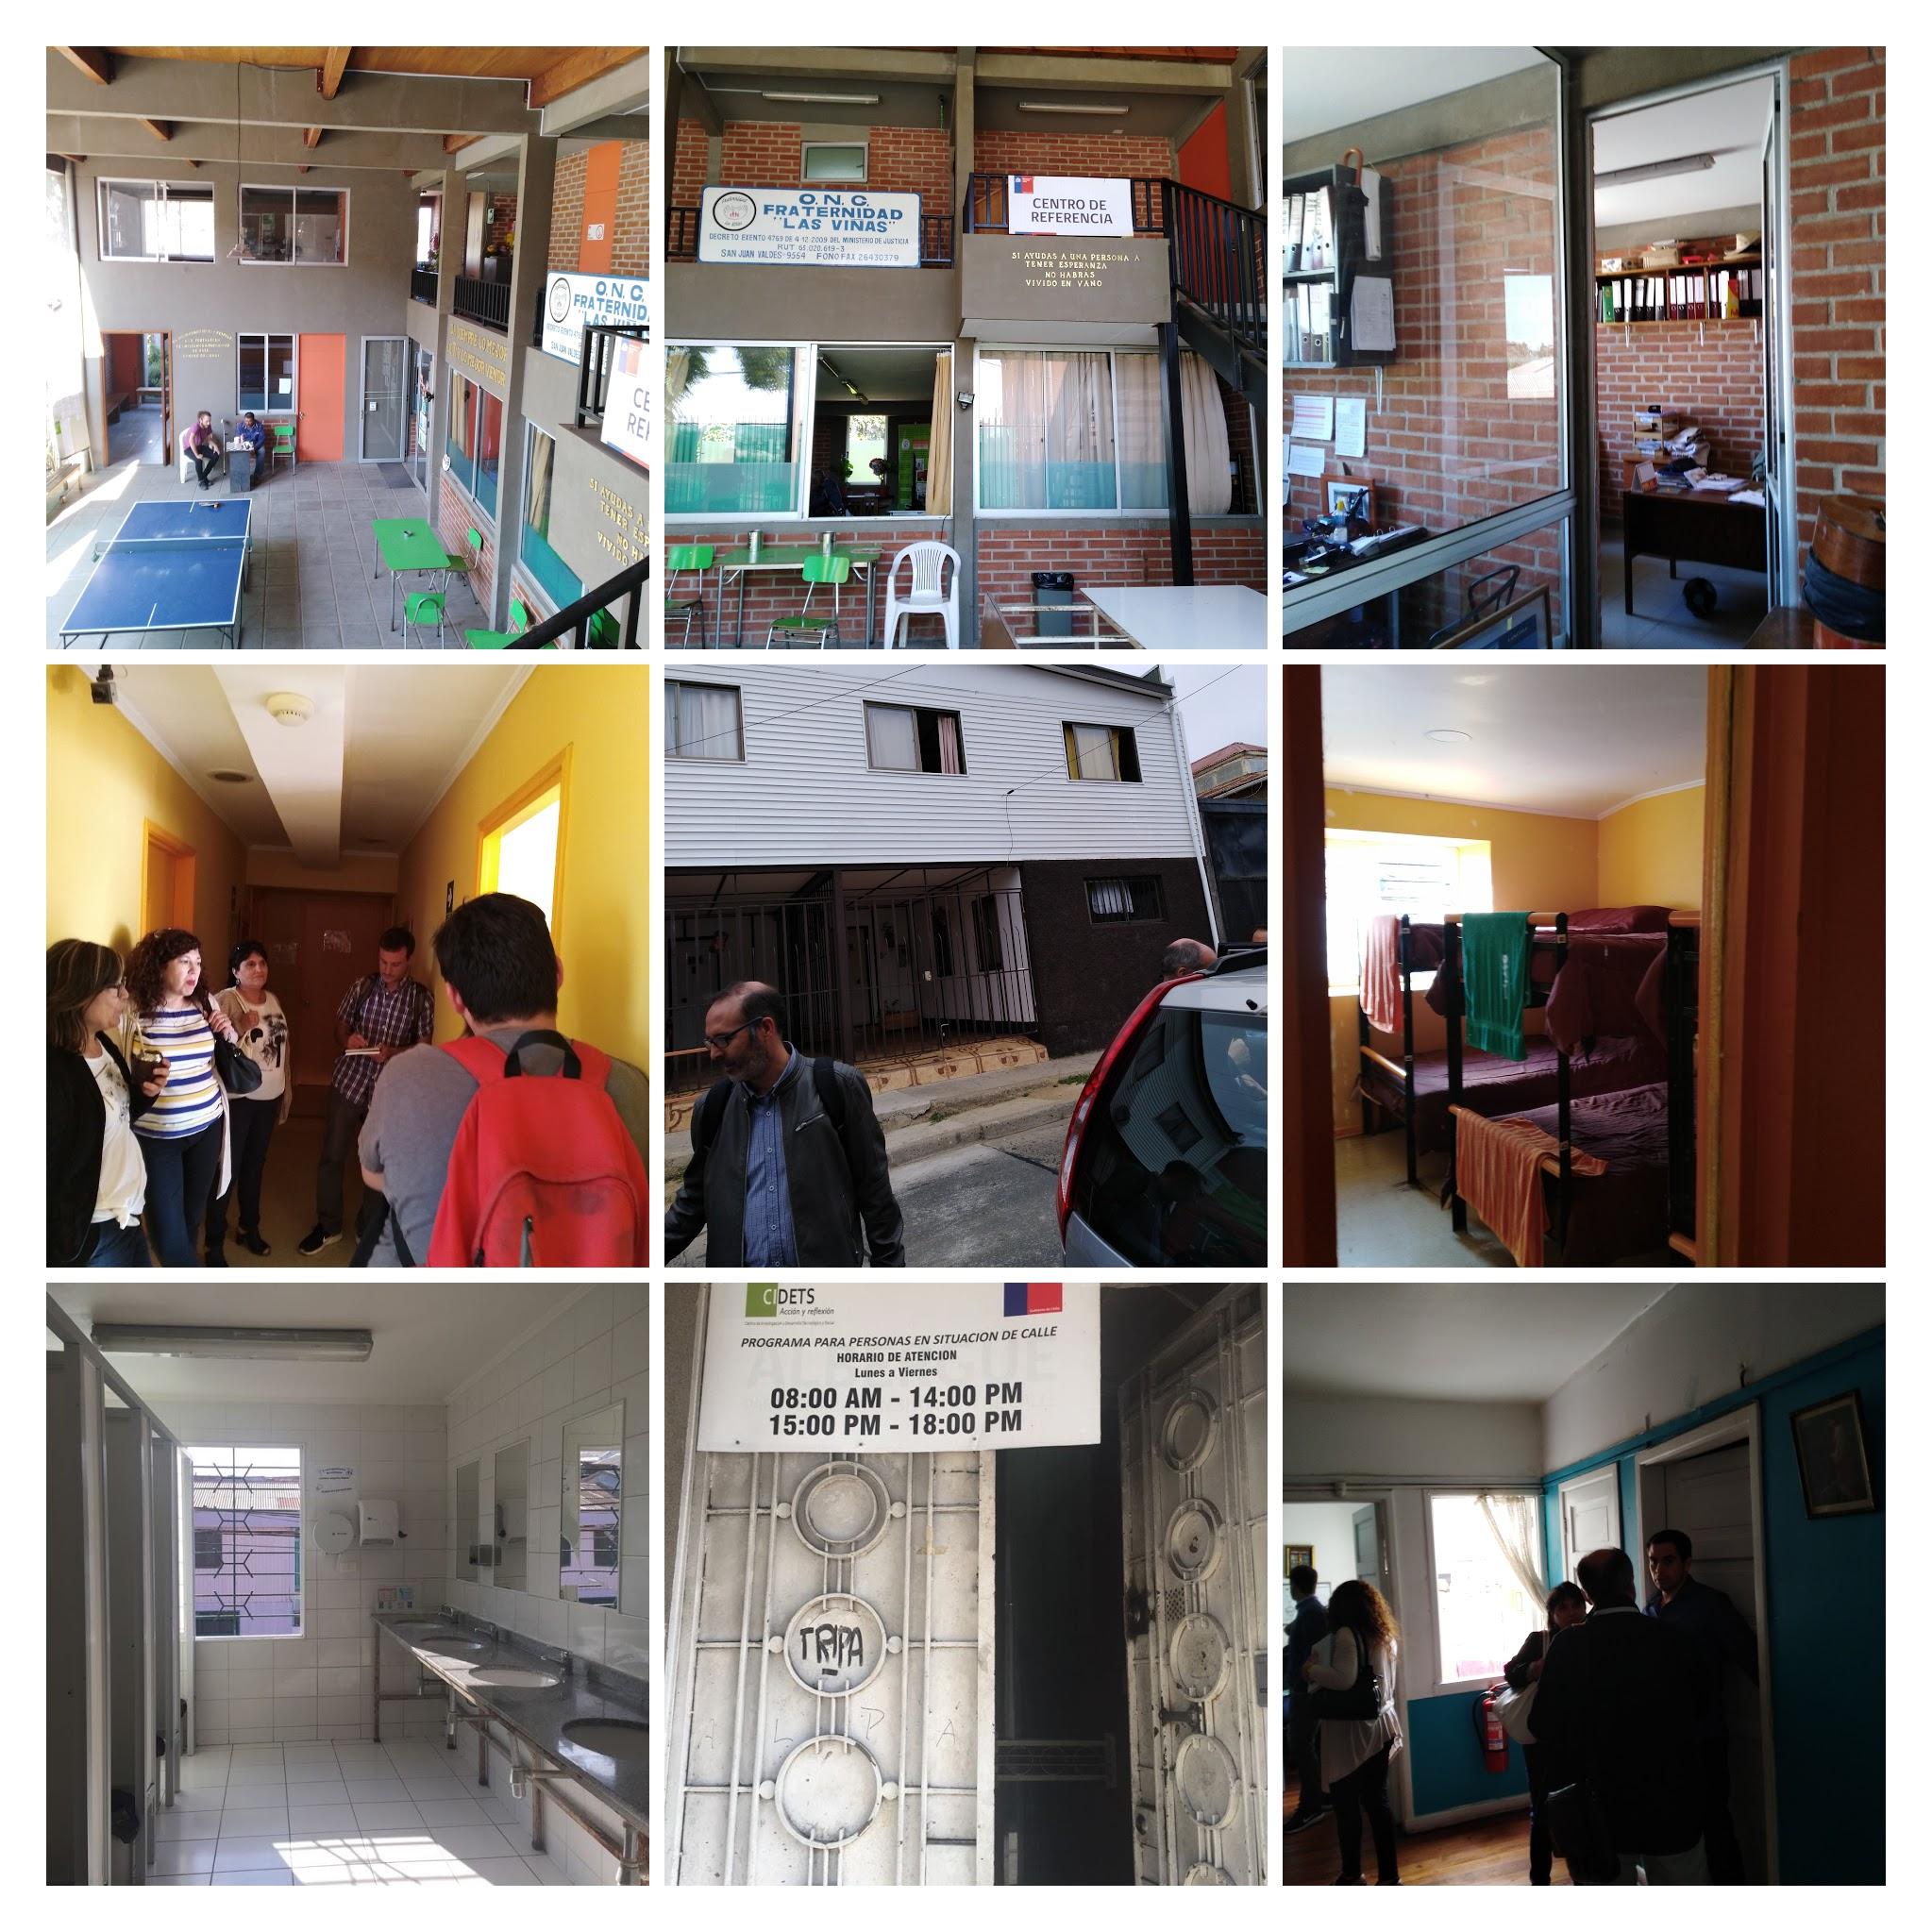 "Chile: Recorrida por Centro de Referencia Las Viñas, Casa compartida en Playa Ancha, Hospedería Hogar de Cristo, Centro de Día Fundación Don Bosco, Centro de Referencia ""SEDEJ""."